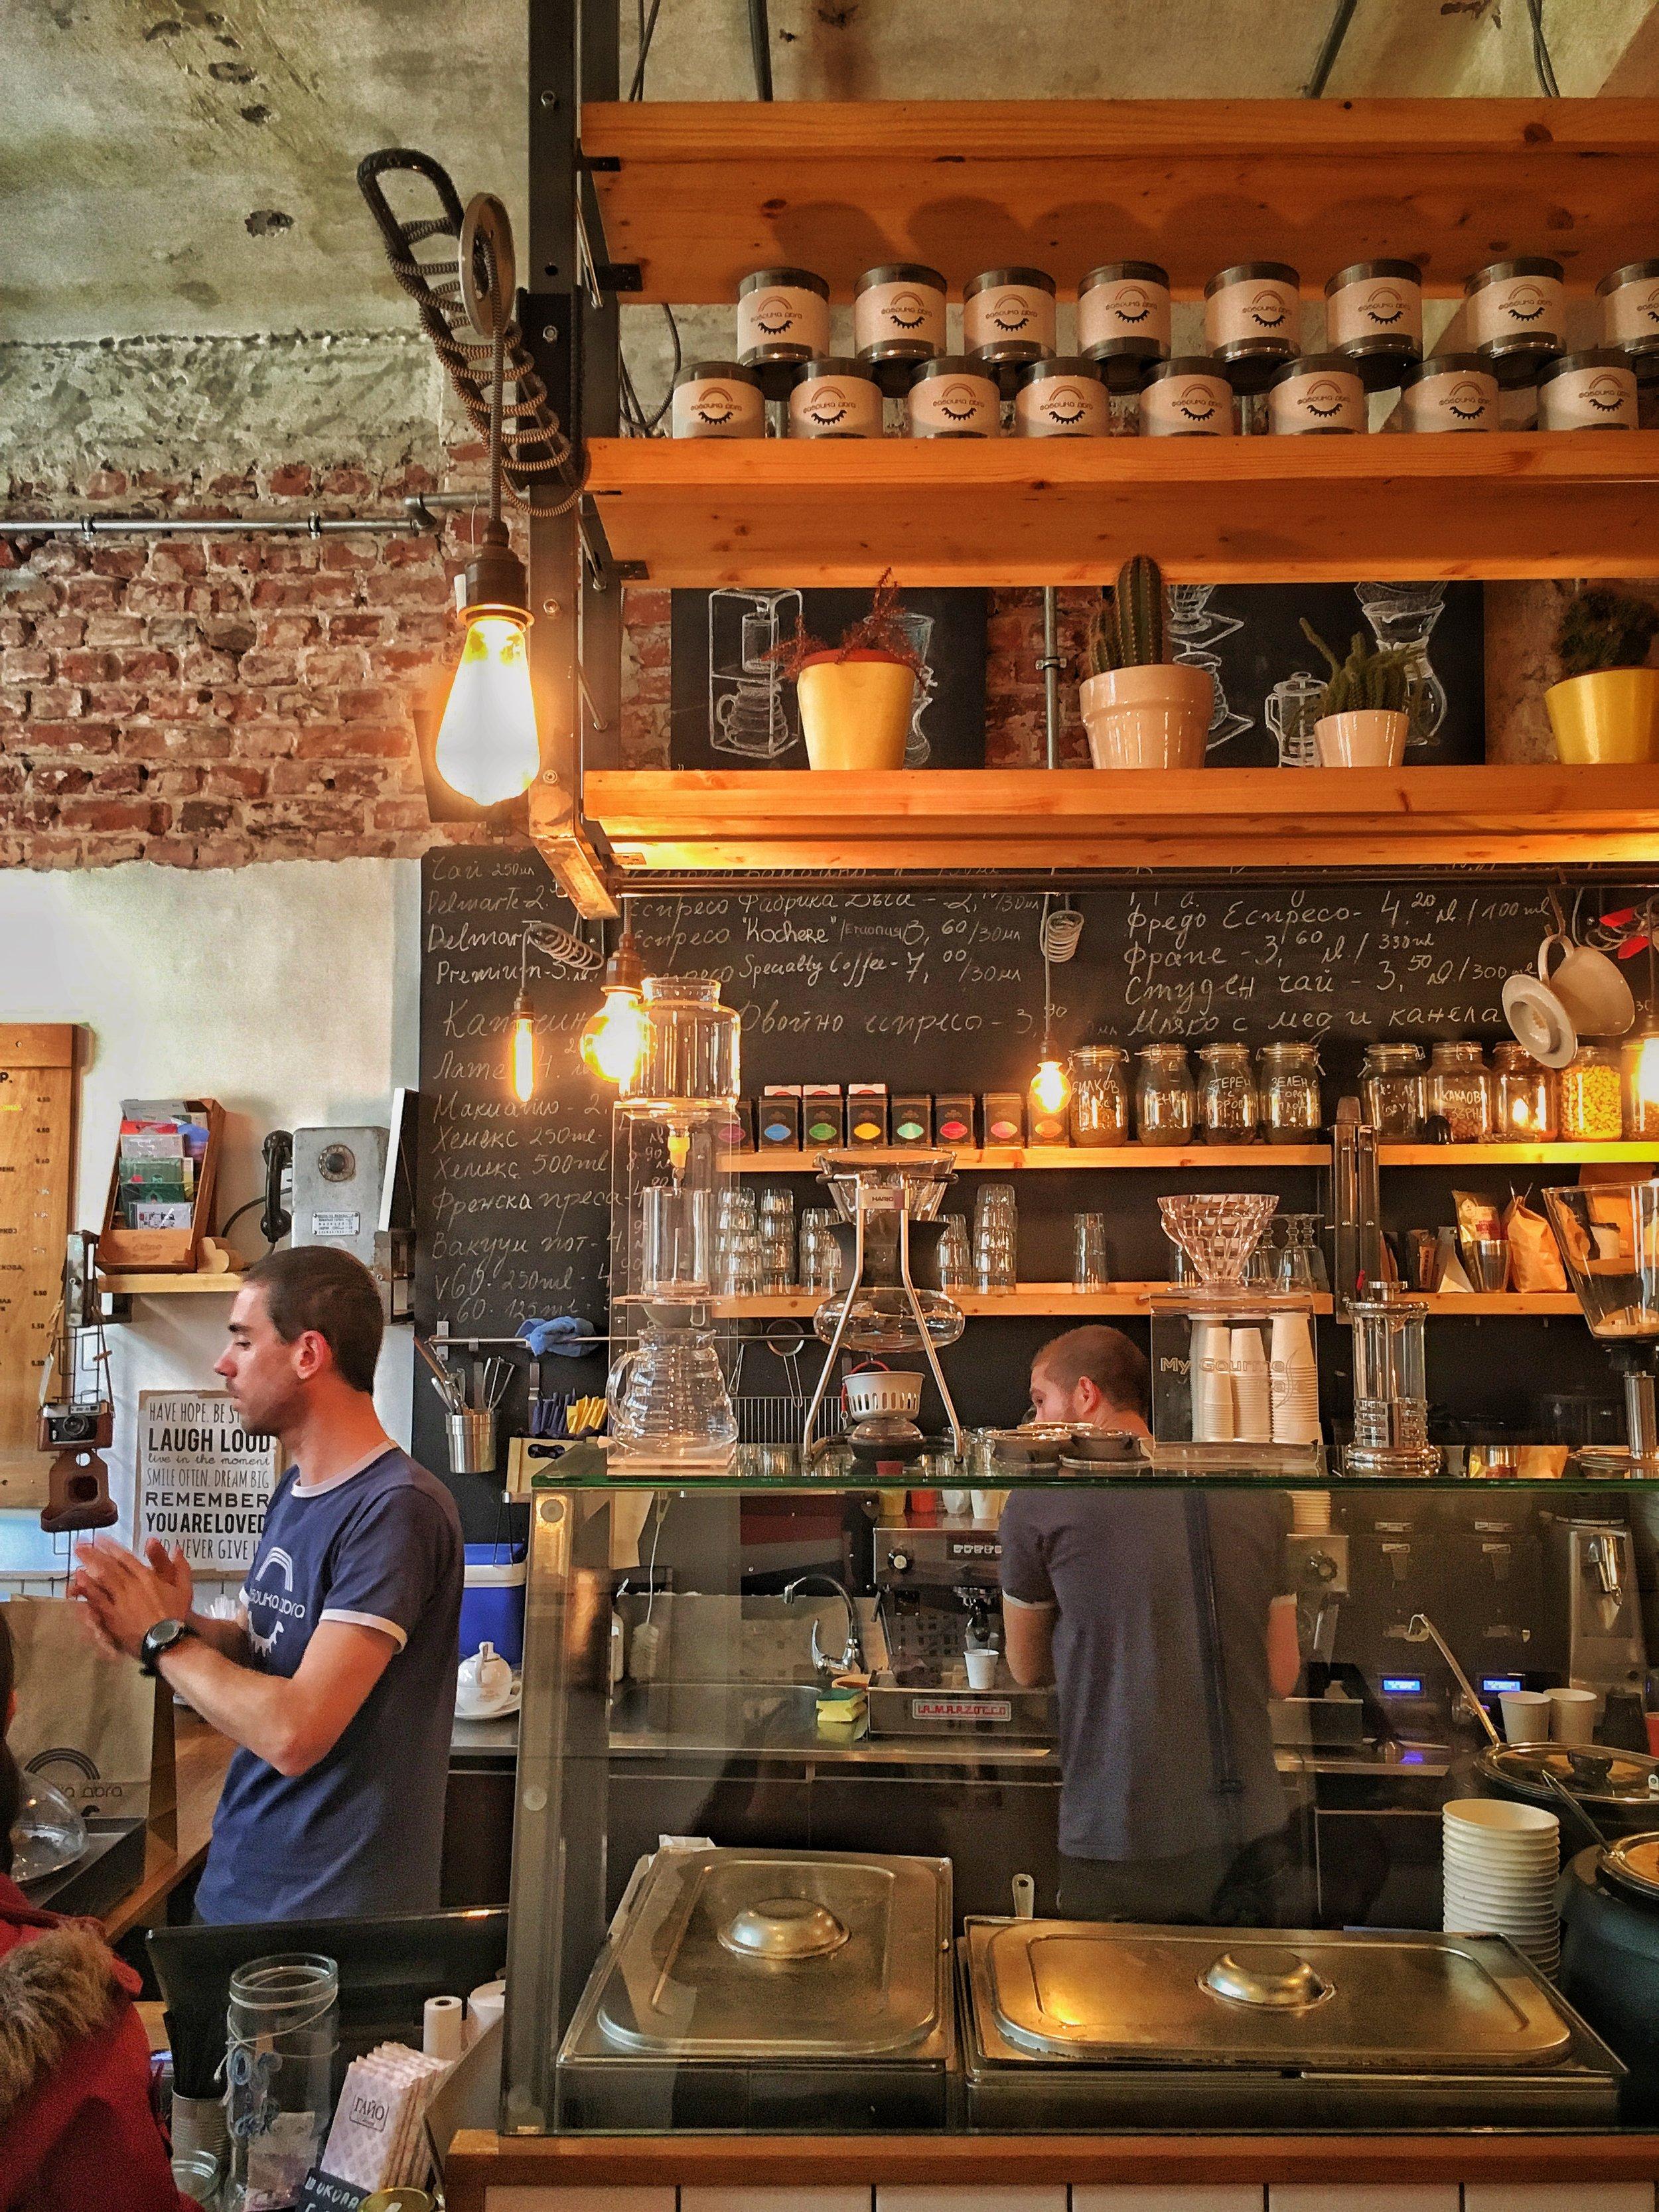 Cafe-Sofia-Bulgaria-Brown-Leather-Book